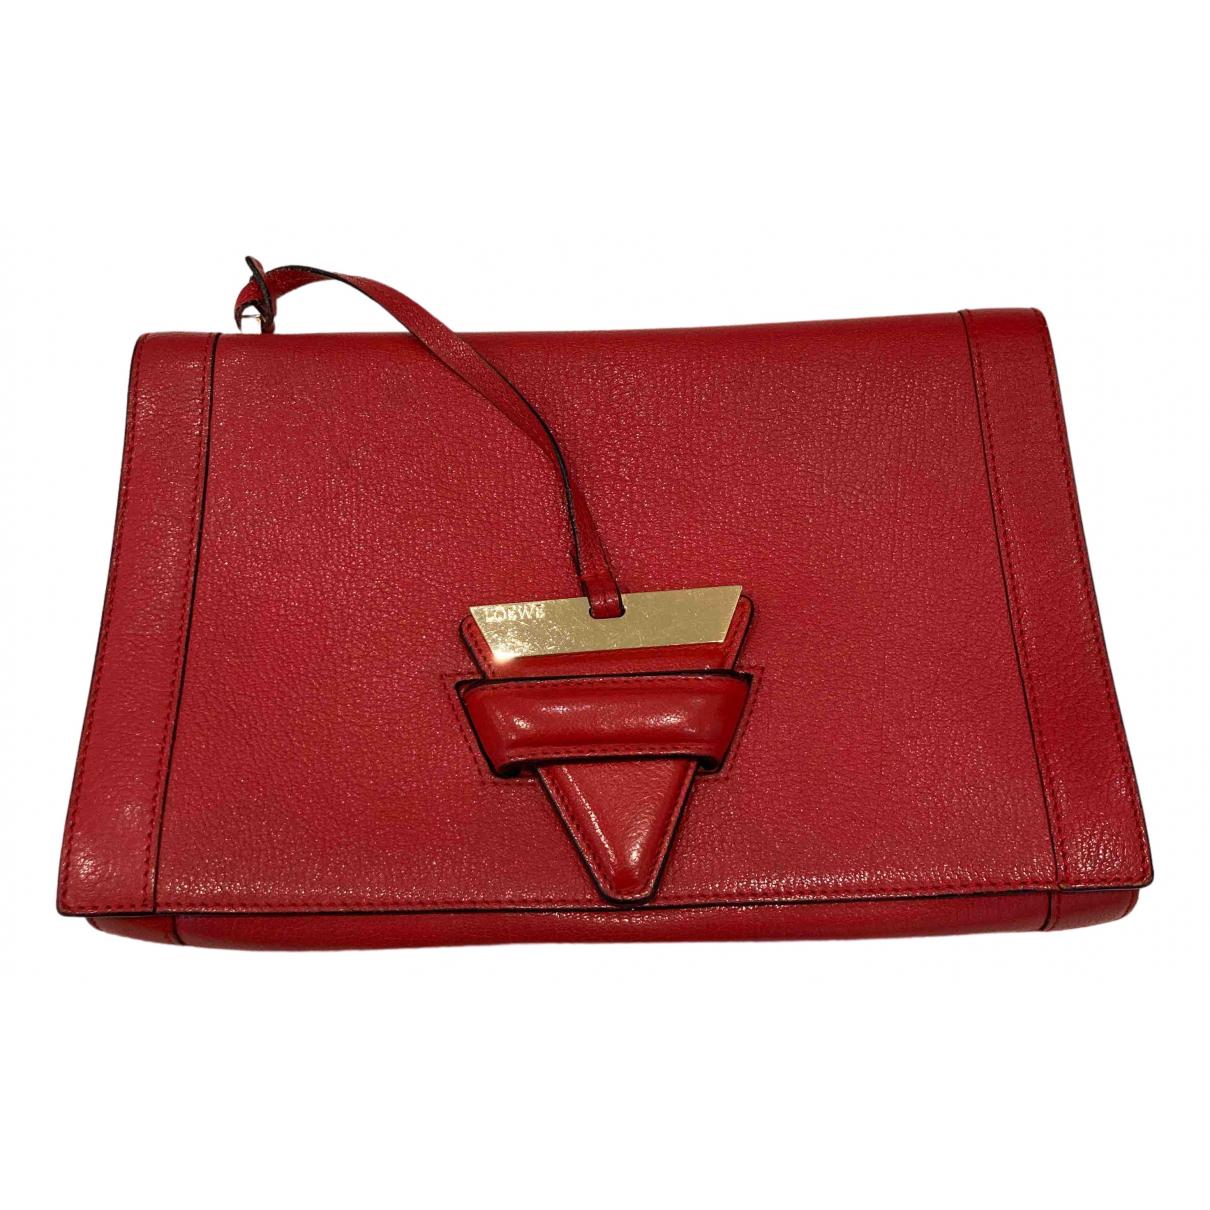 Loewe Barcelona Red Leather Clutch bag for Women N